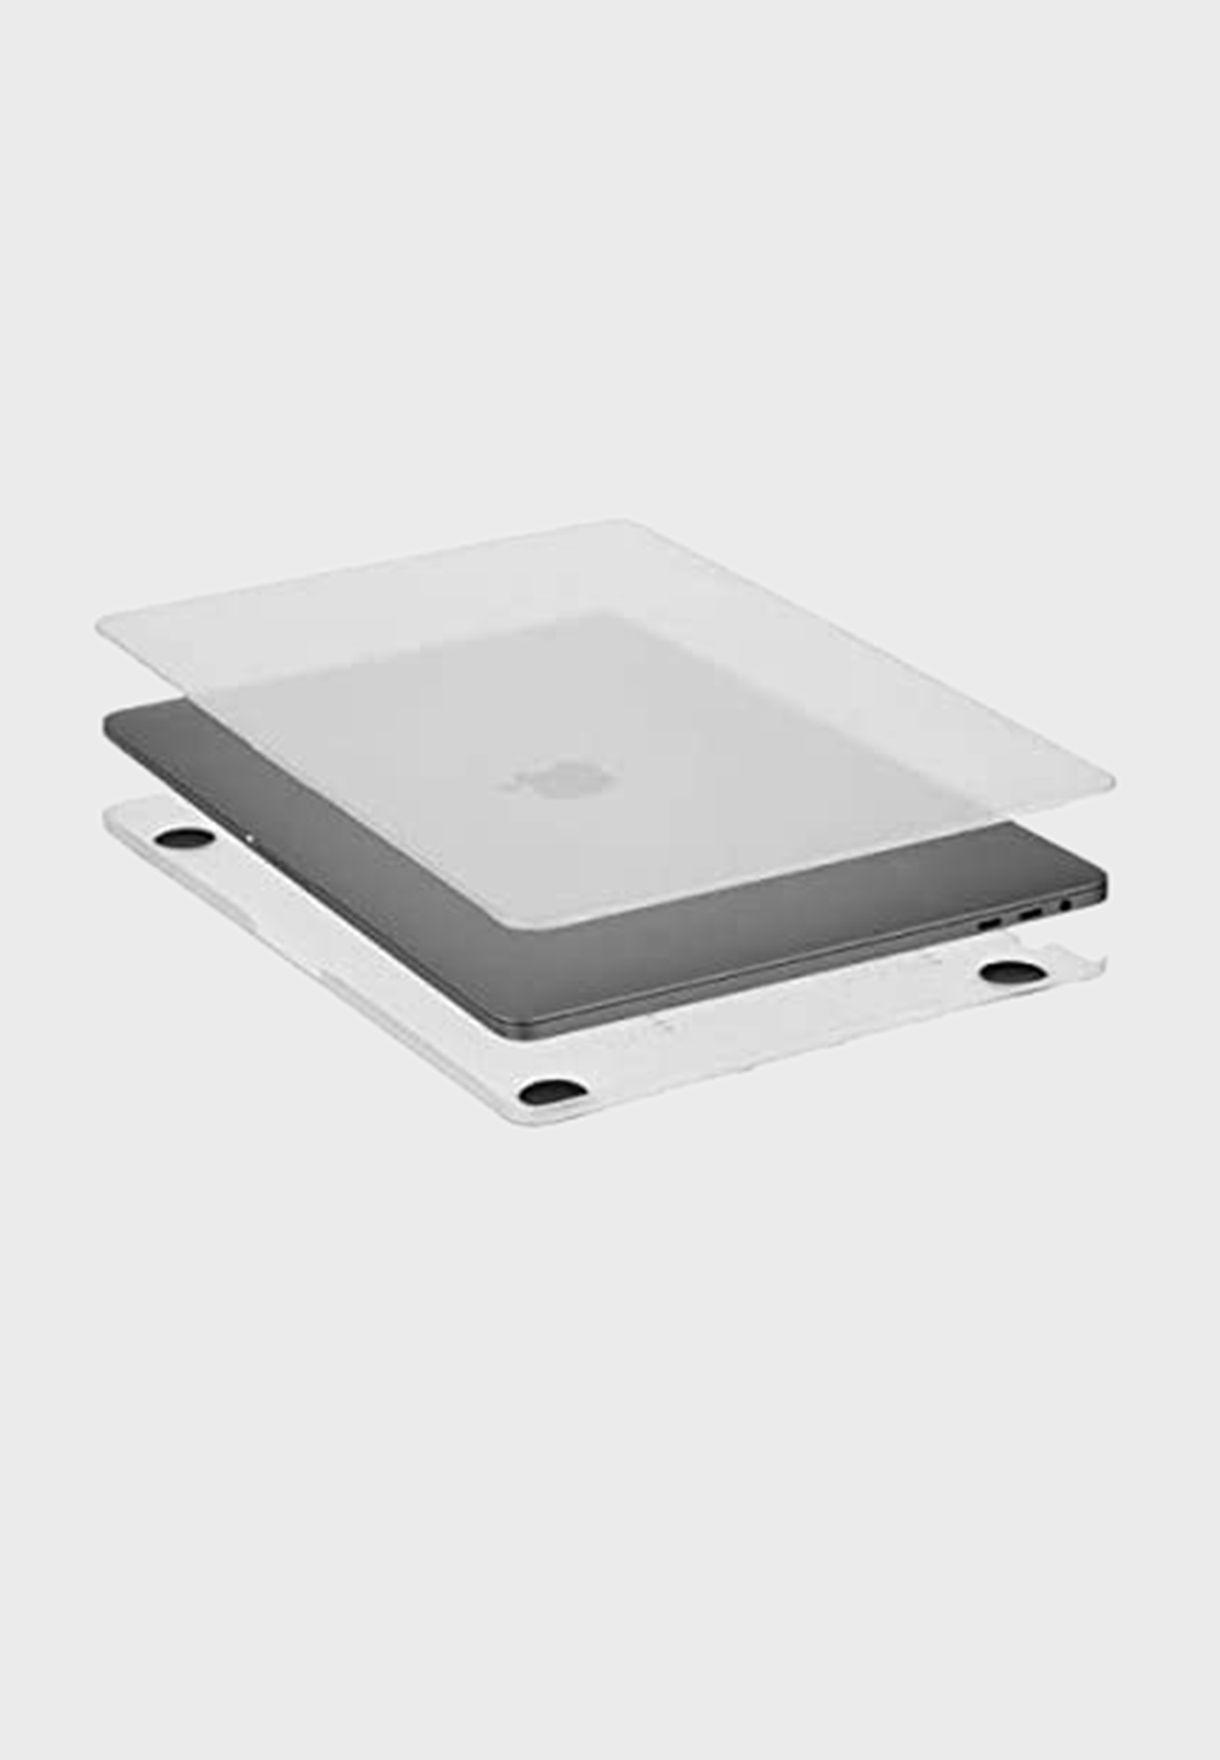 "13"" Macbook Pro Snap-On Case"